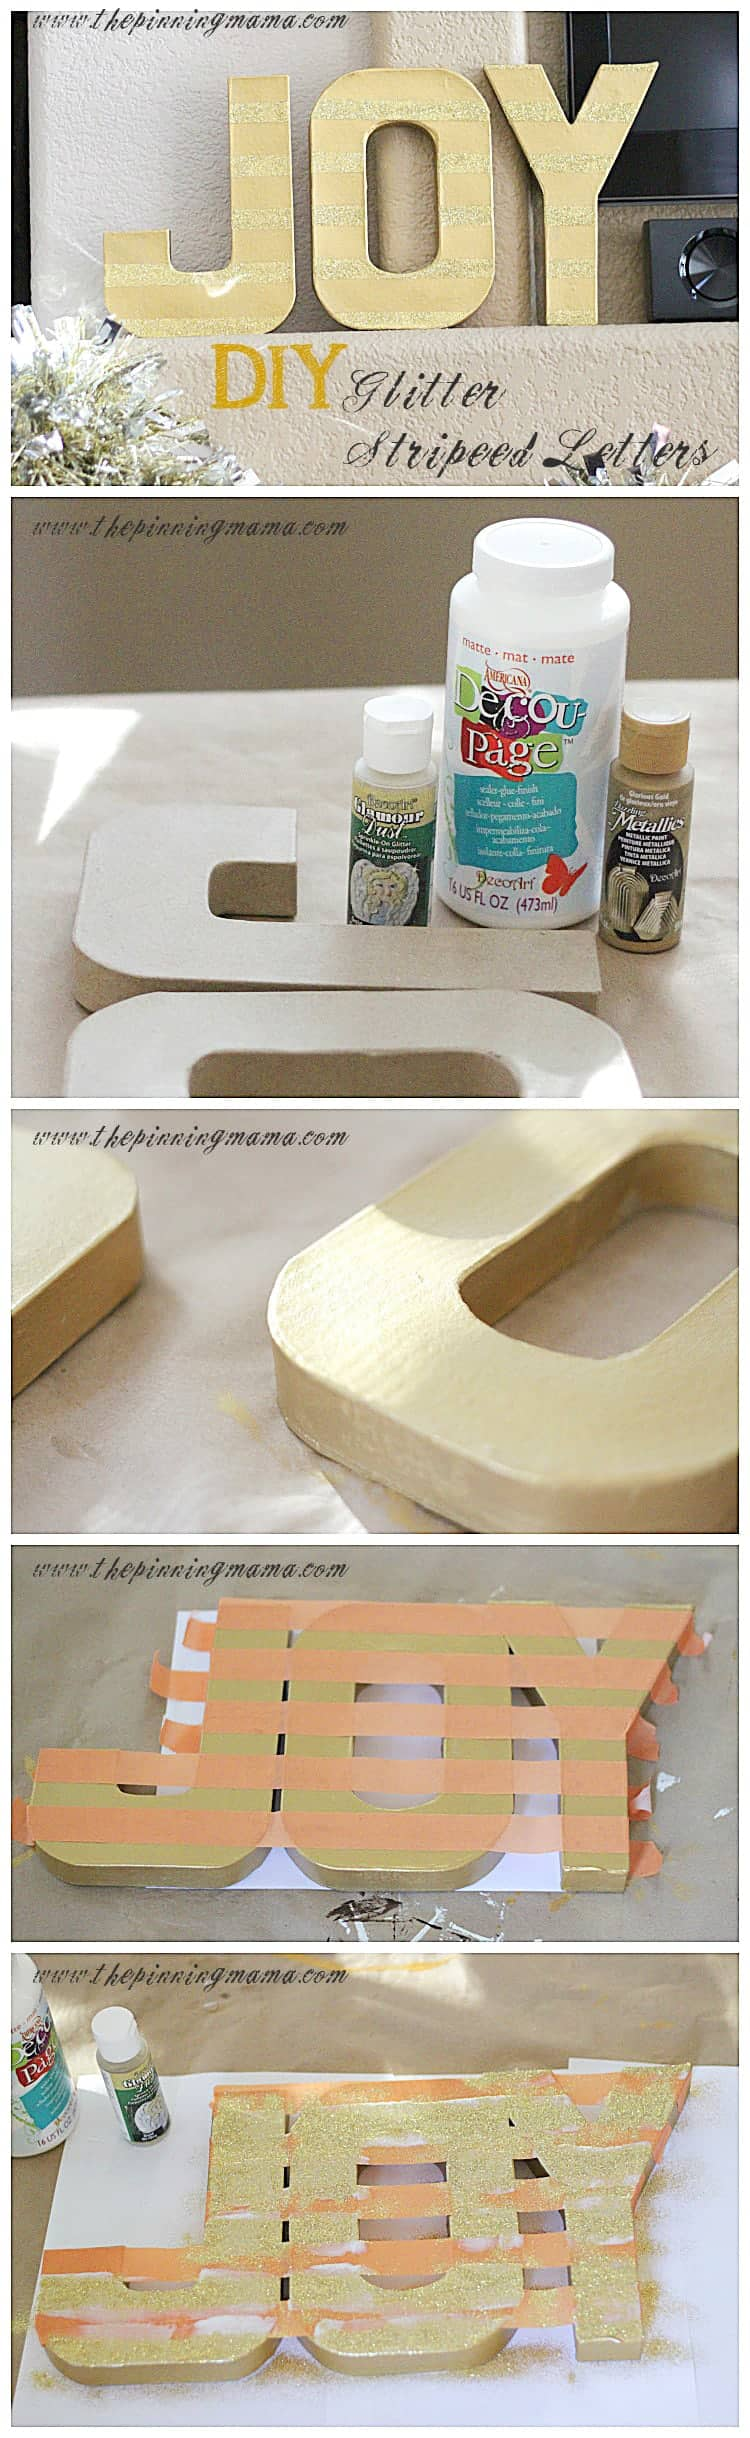 DIY Glitter Striped Joy Letters {Easy Christmas Decor} by www.thepinningmama.com